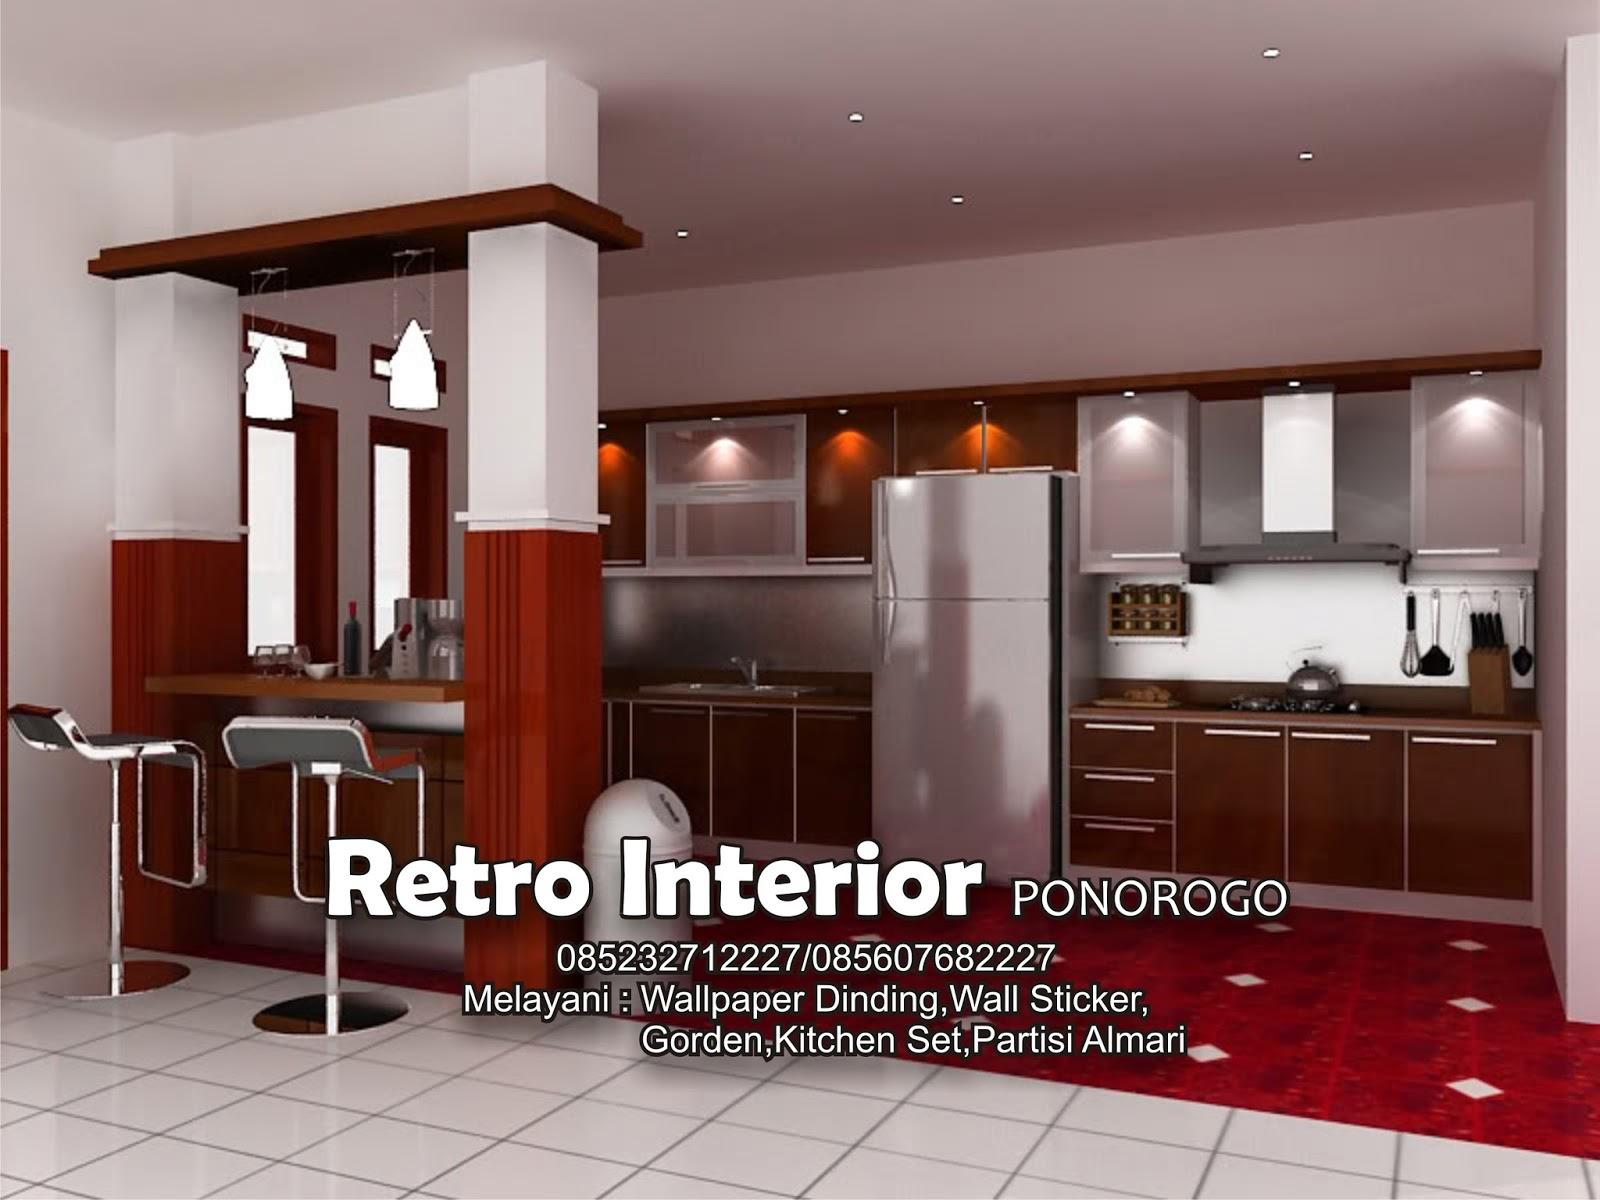 Secara Umum Kitchen Set Merupakan Furniture Yang Dibuat Untuk Mewadahi  Keperluan Memasak ...